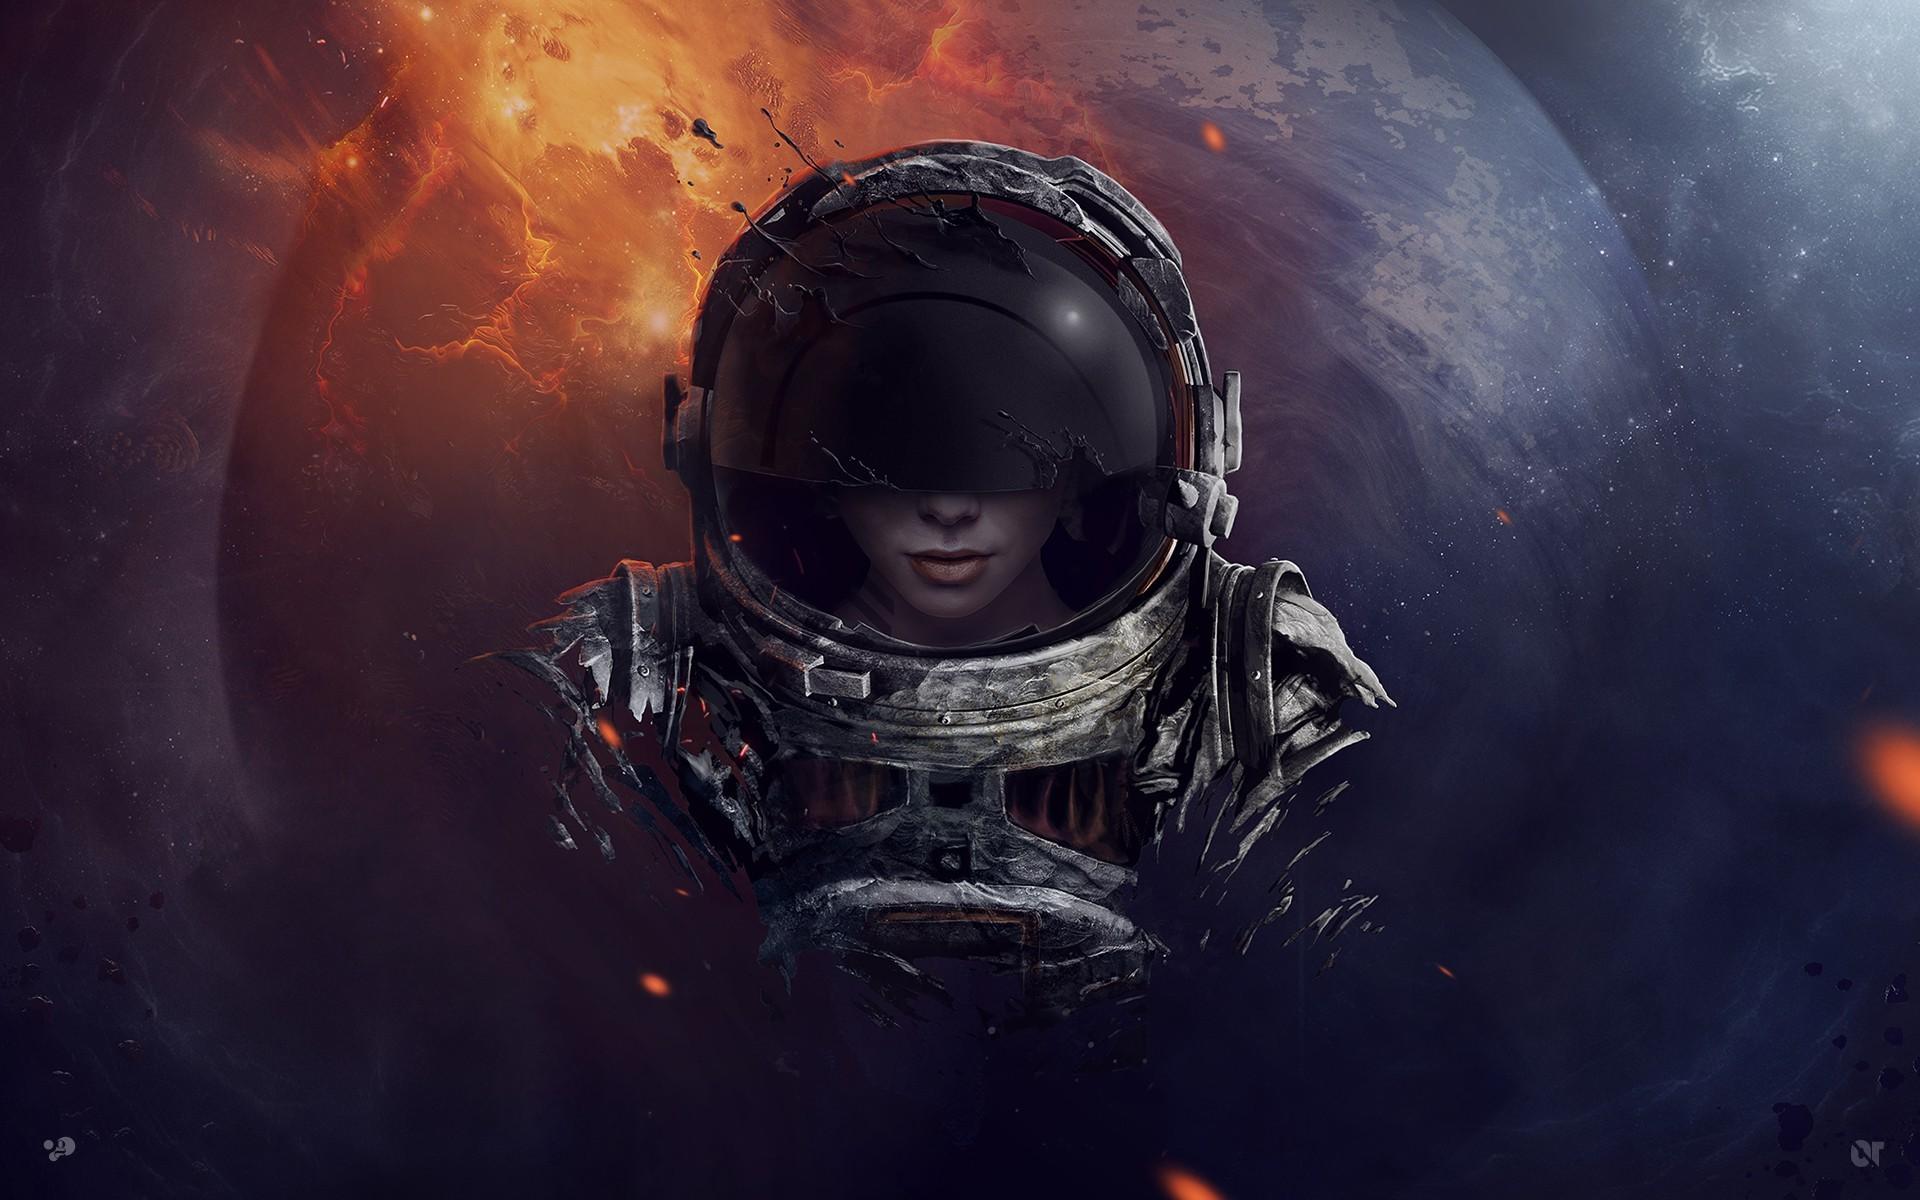 Female Astronaut Art Background , HD Wallpaper & Backgrounds